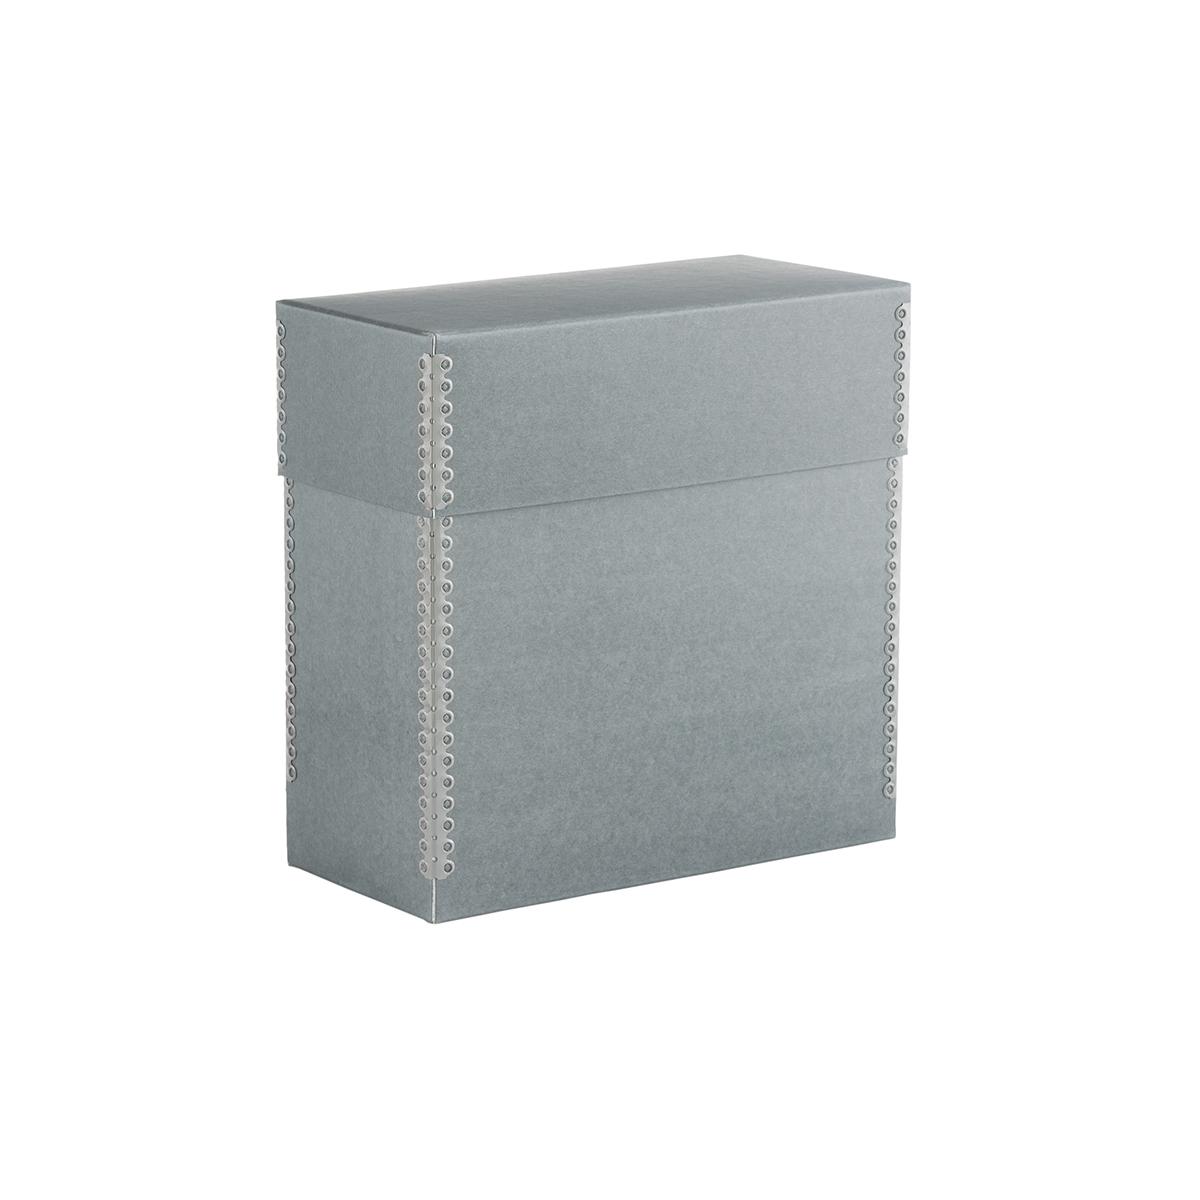 Upright Archival Storage Box